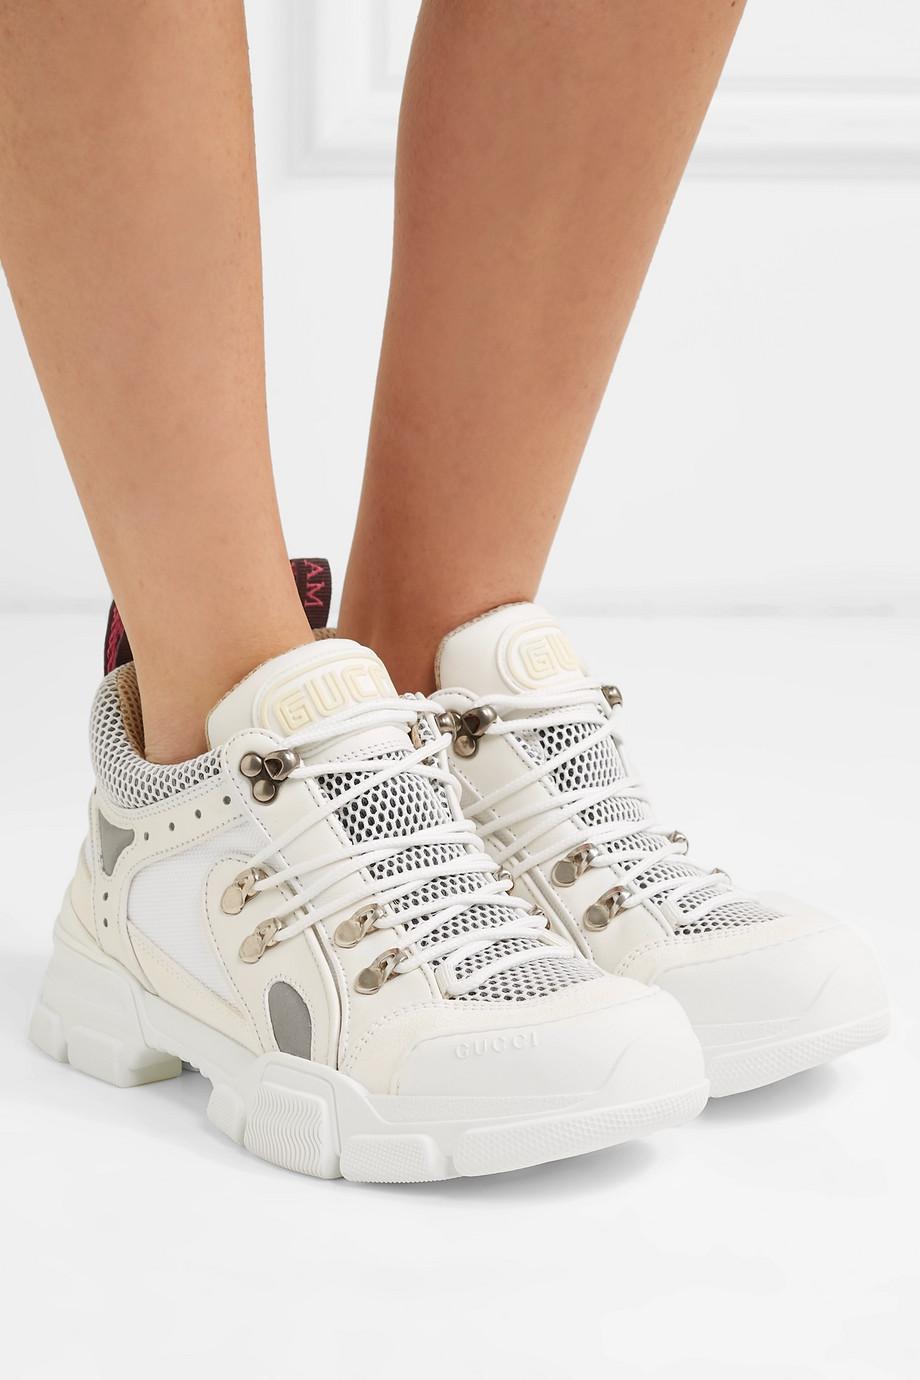 Gucci Flashtrek 标志压花皮革绒面革网眼运动鞋